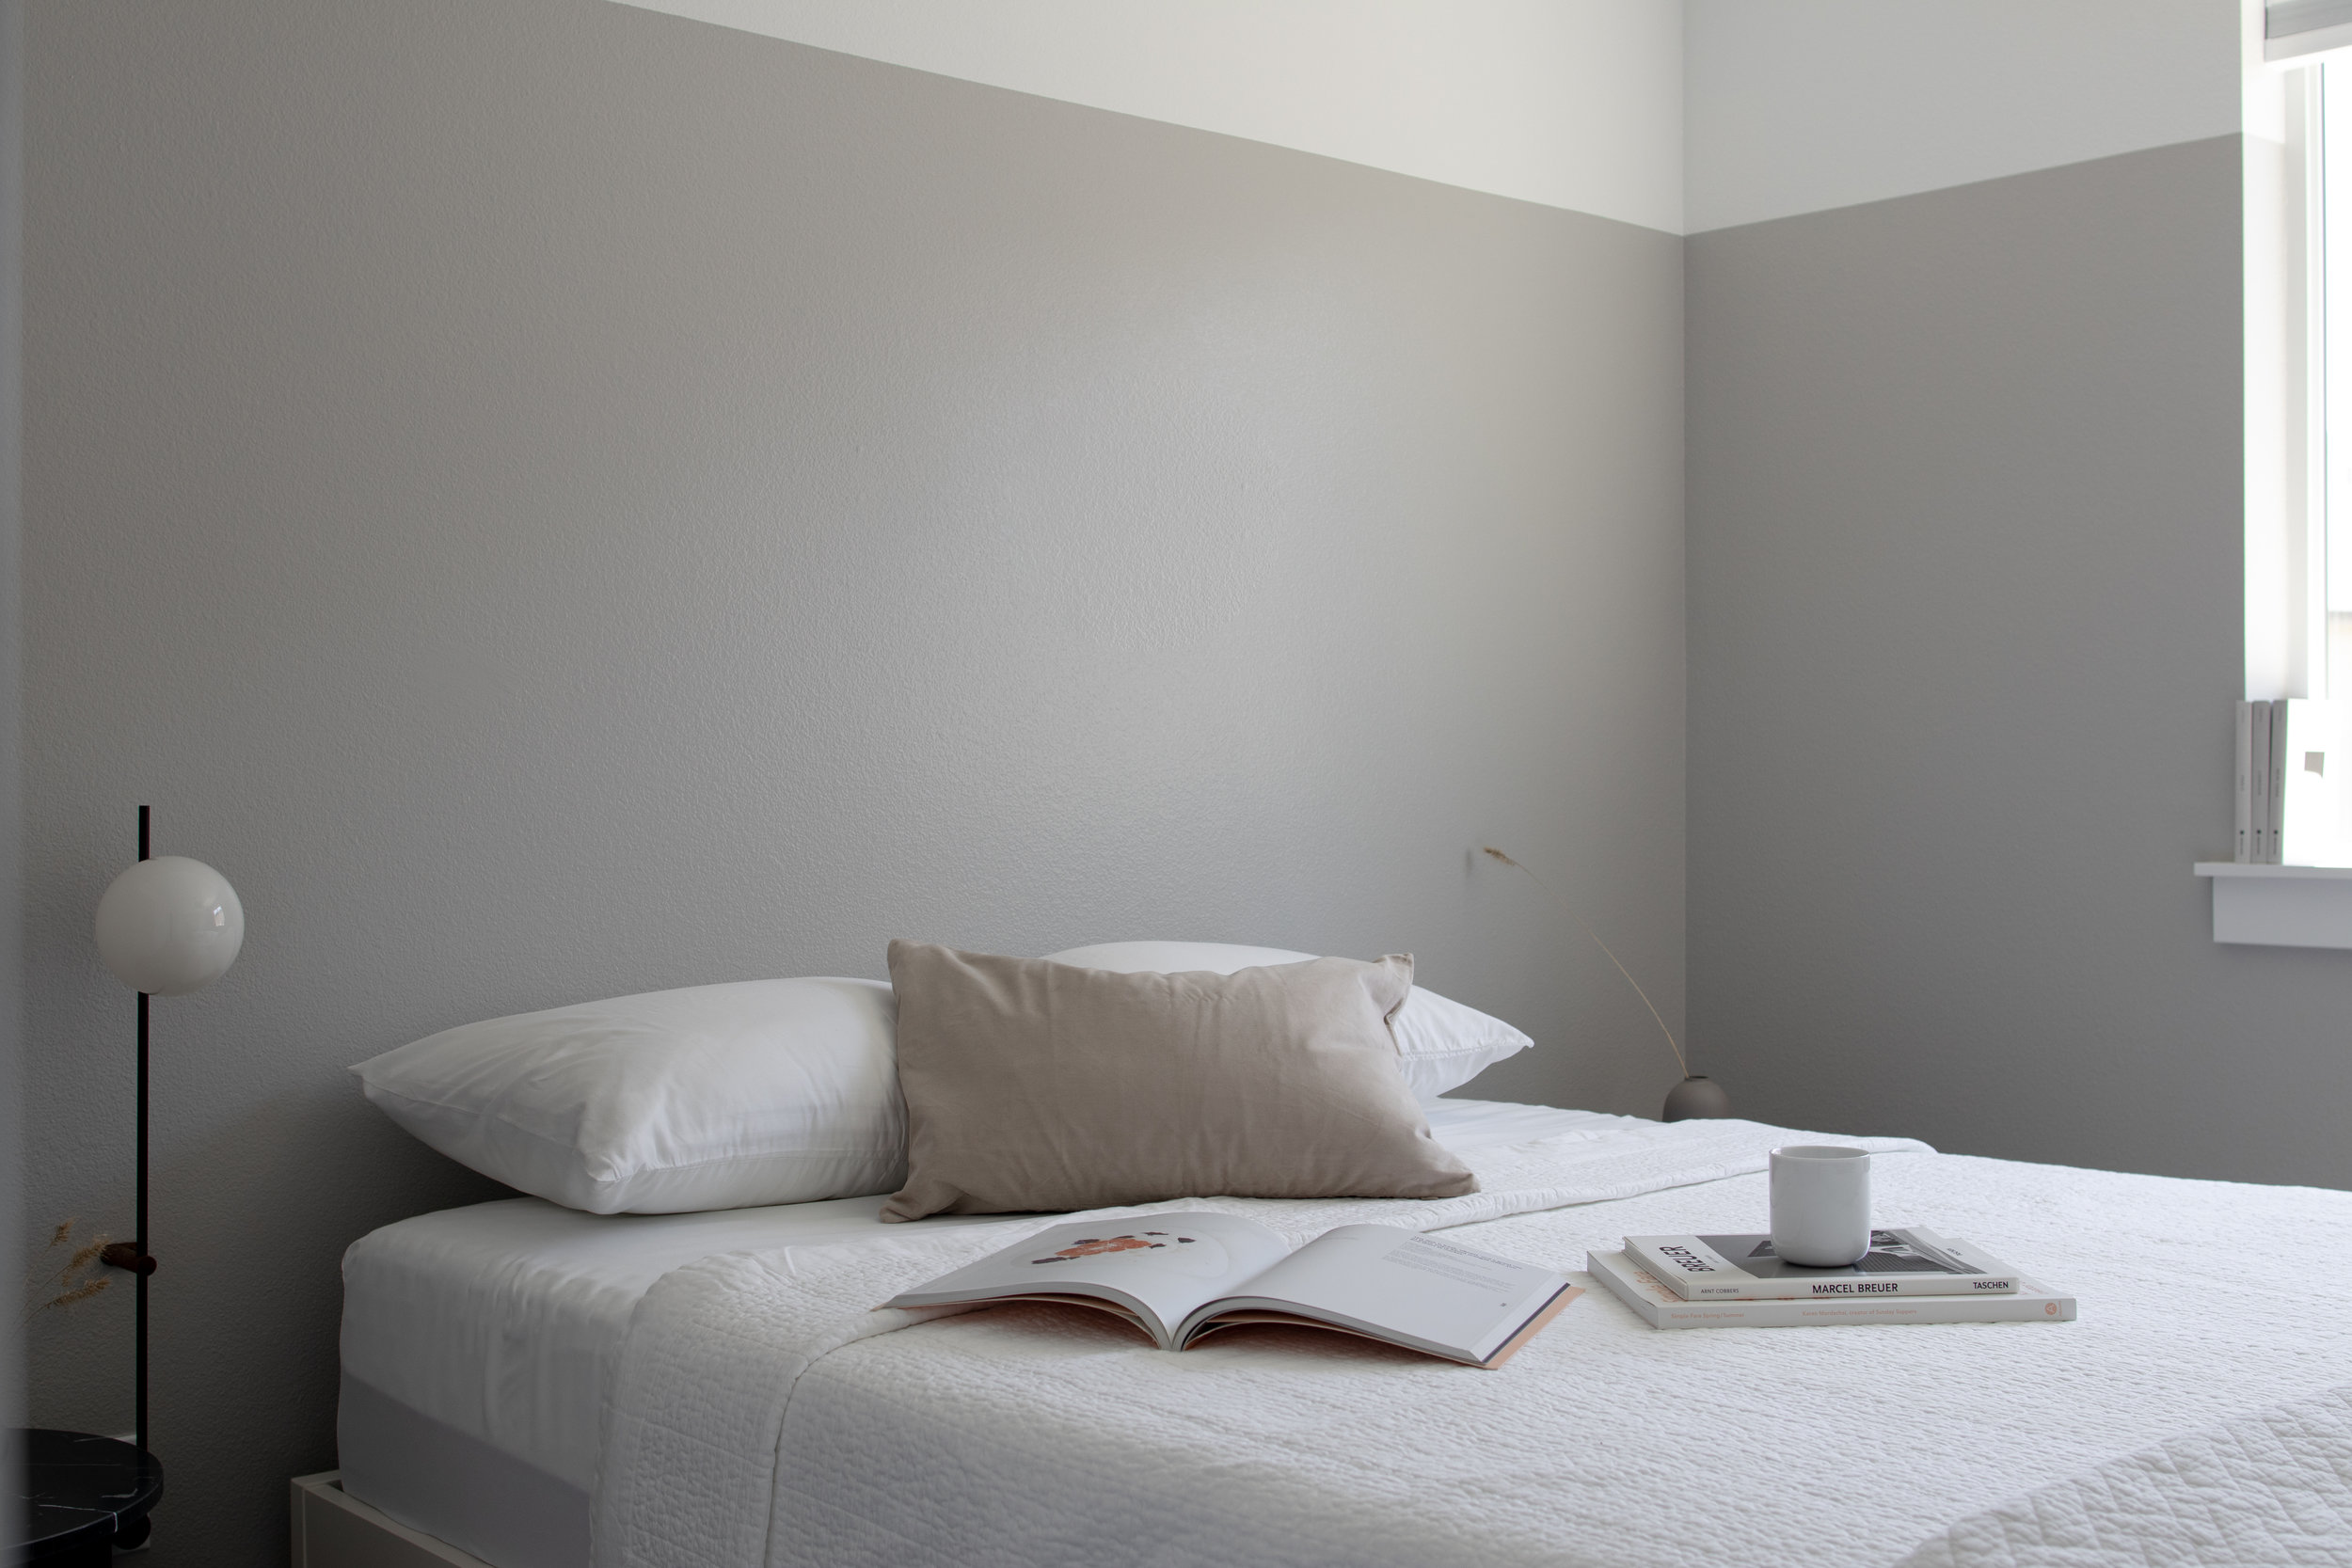 Minimalist guest bedroom in muted tones